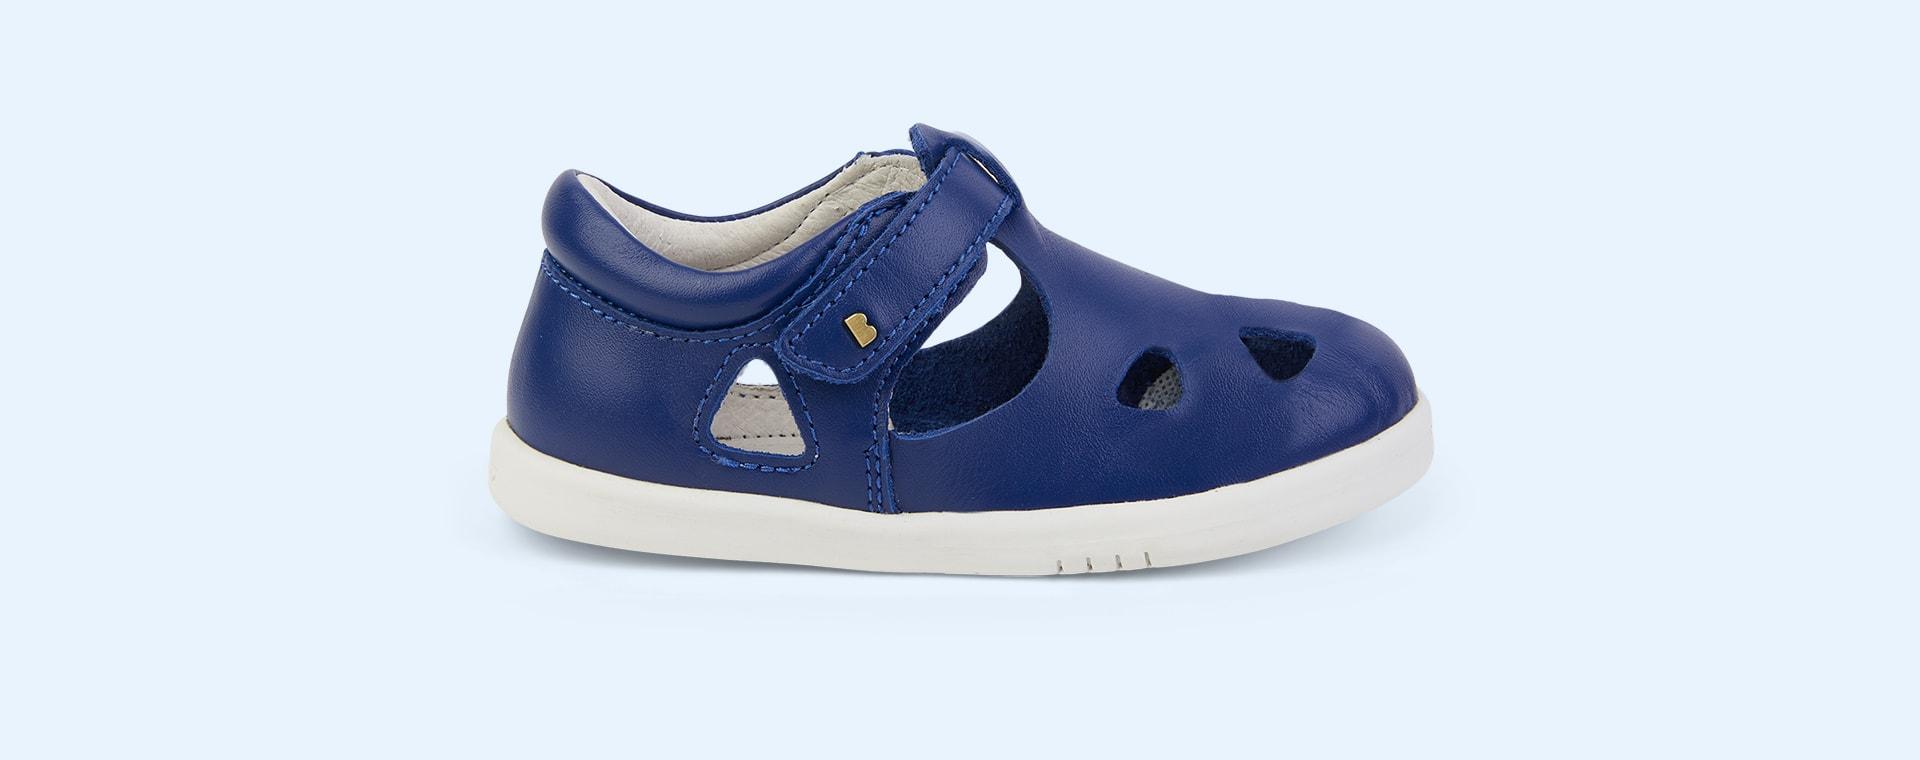 Blueberry Bobux I-Walk Zap Sandal